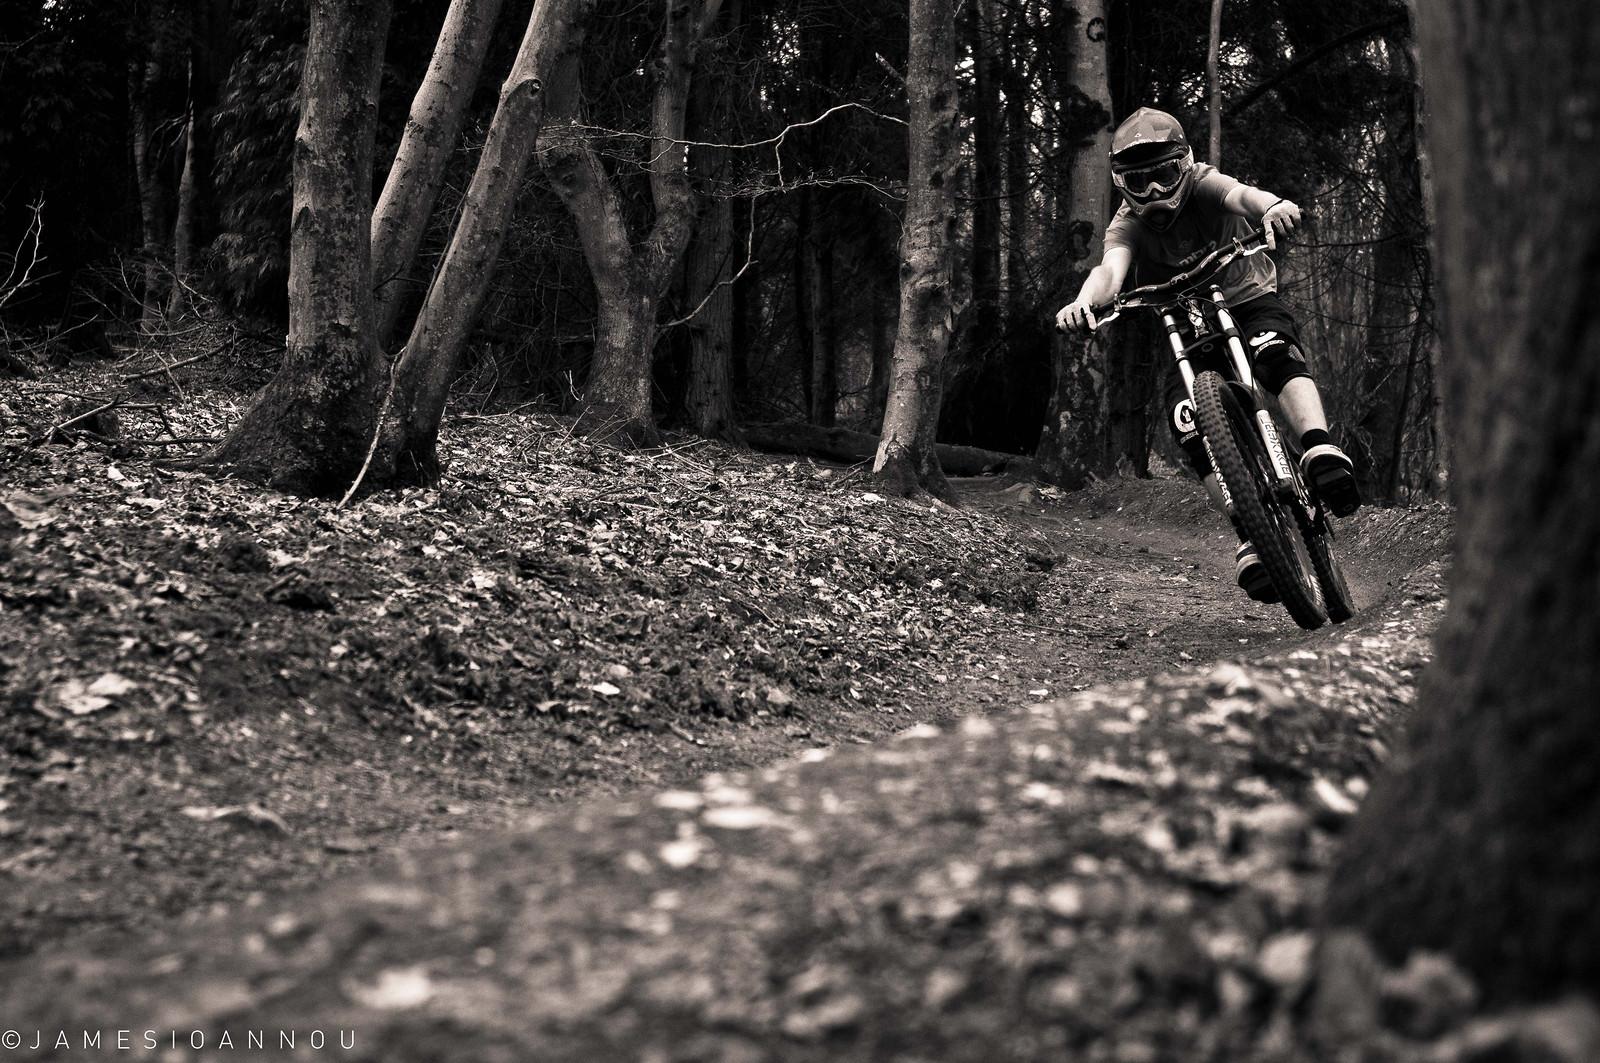 Rob Schaverien - James Ioannou - Mountain Biking Pictures - Vital MTB